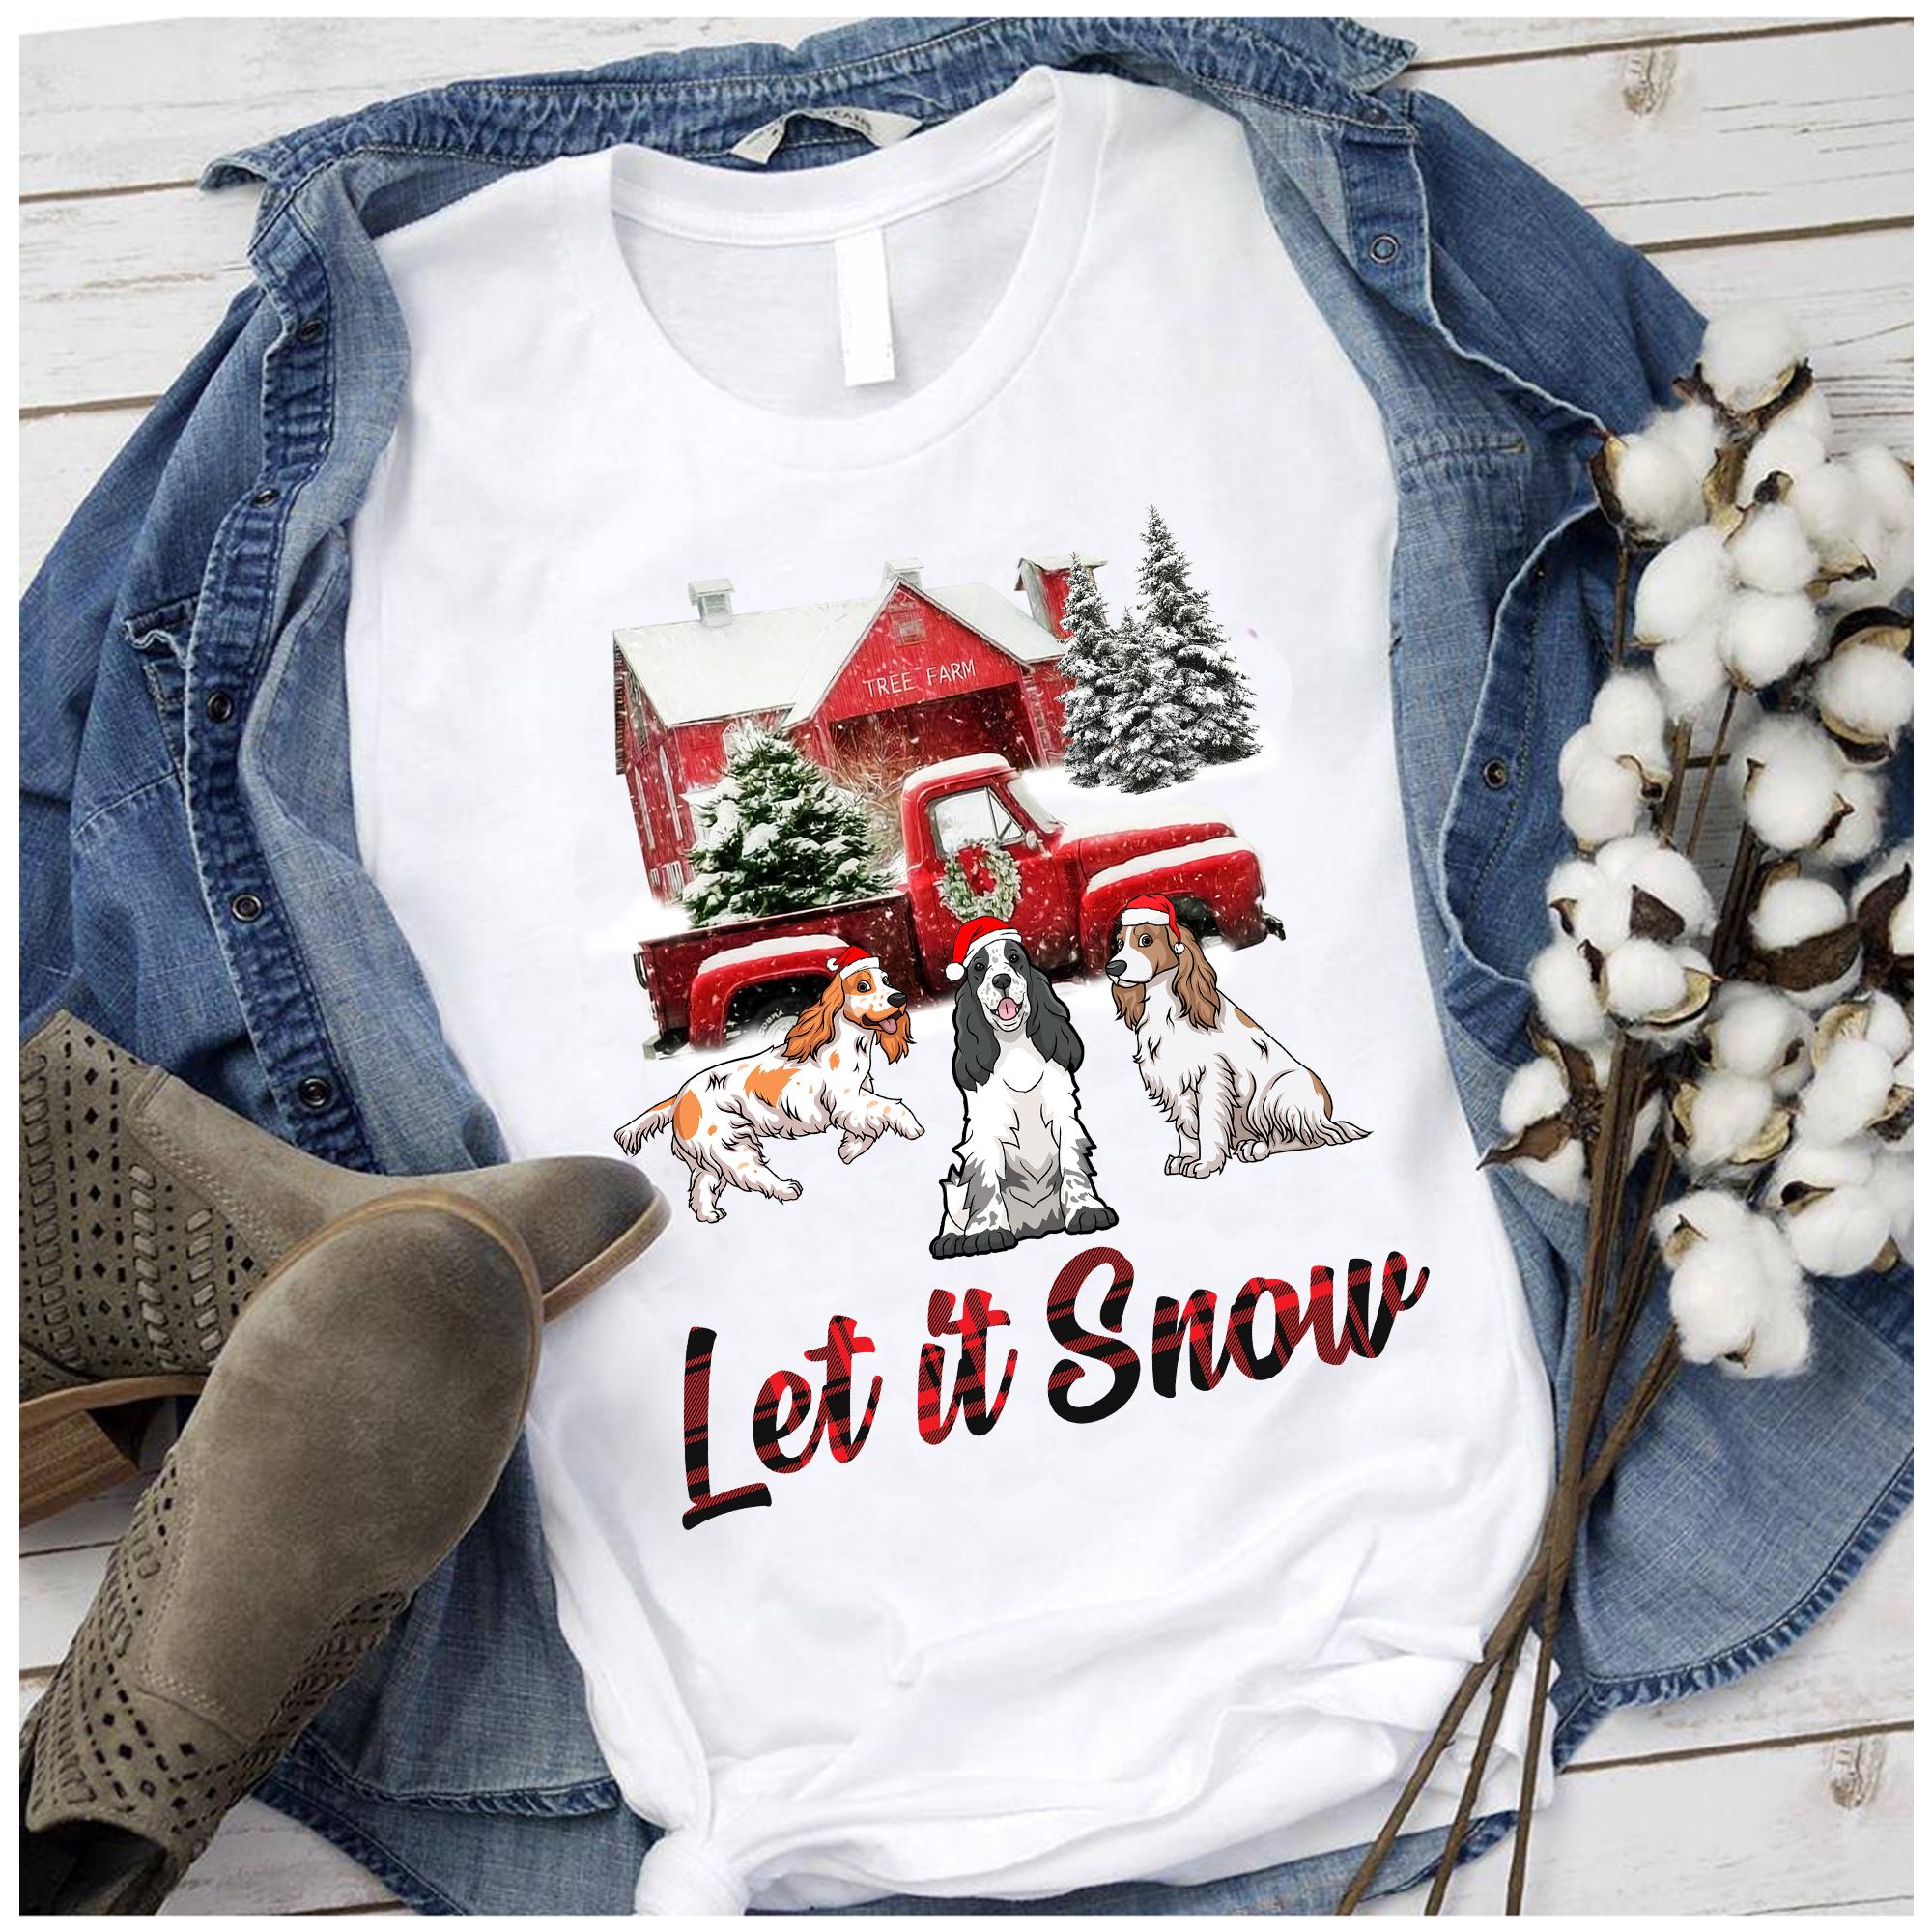 Let It Snow English Cocker Spaniel Christmas T Shirt 100% Cotton